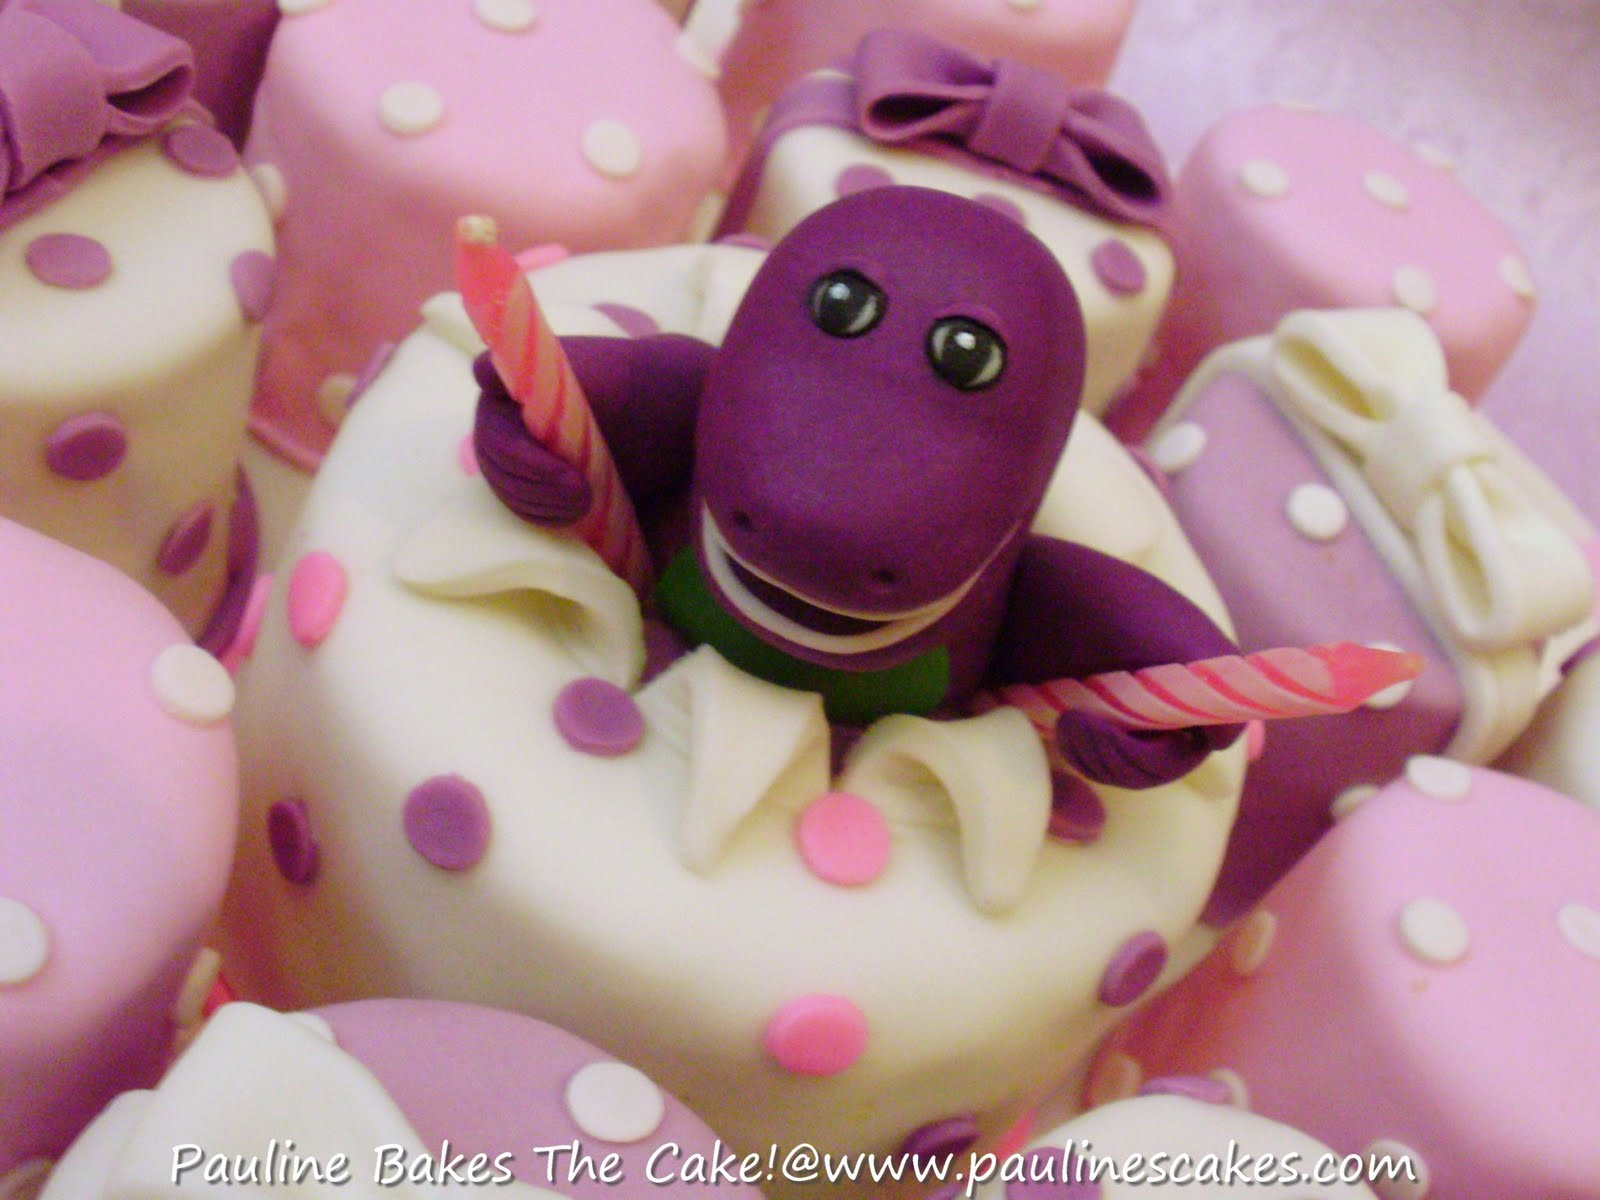 barney cake pops - photo #16